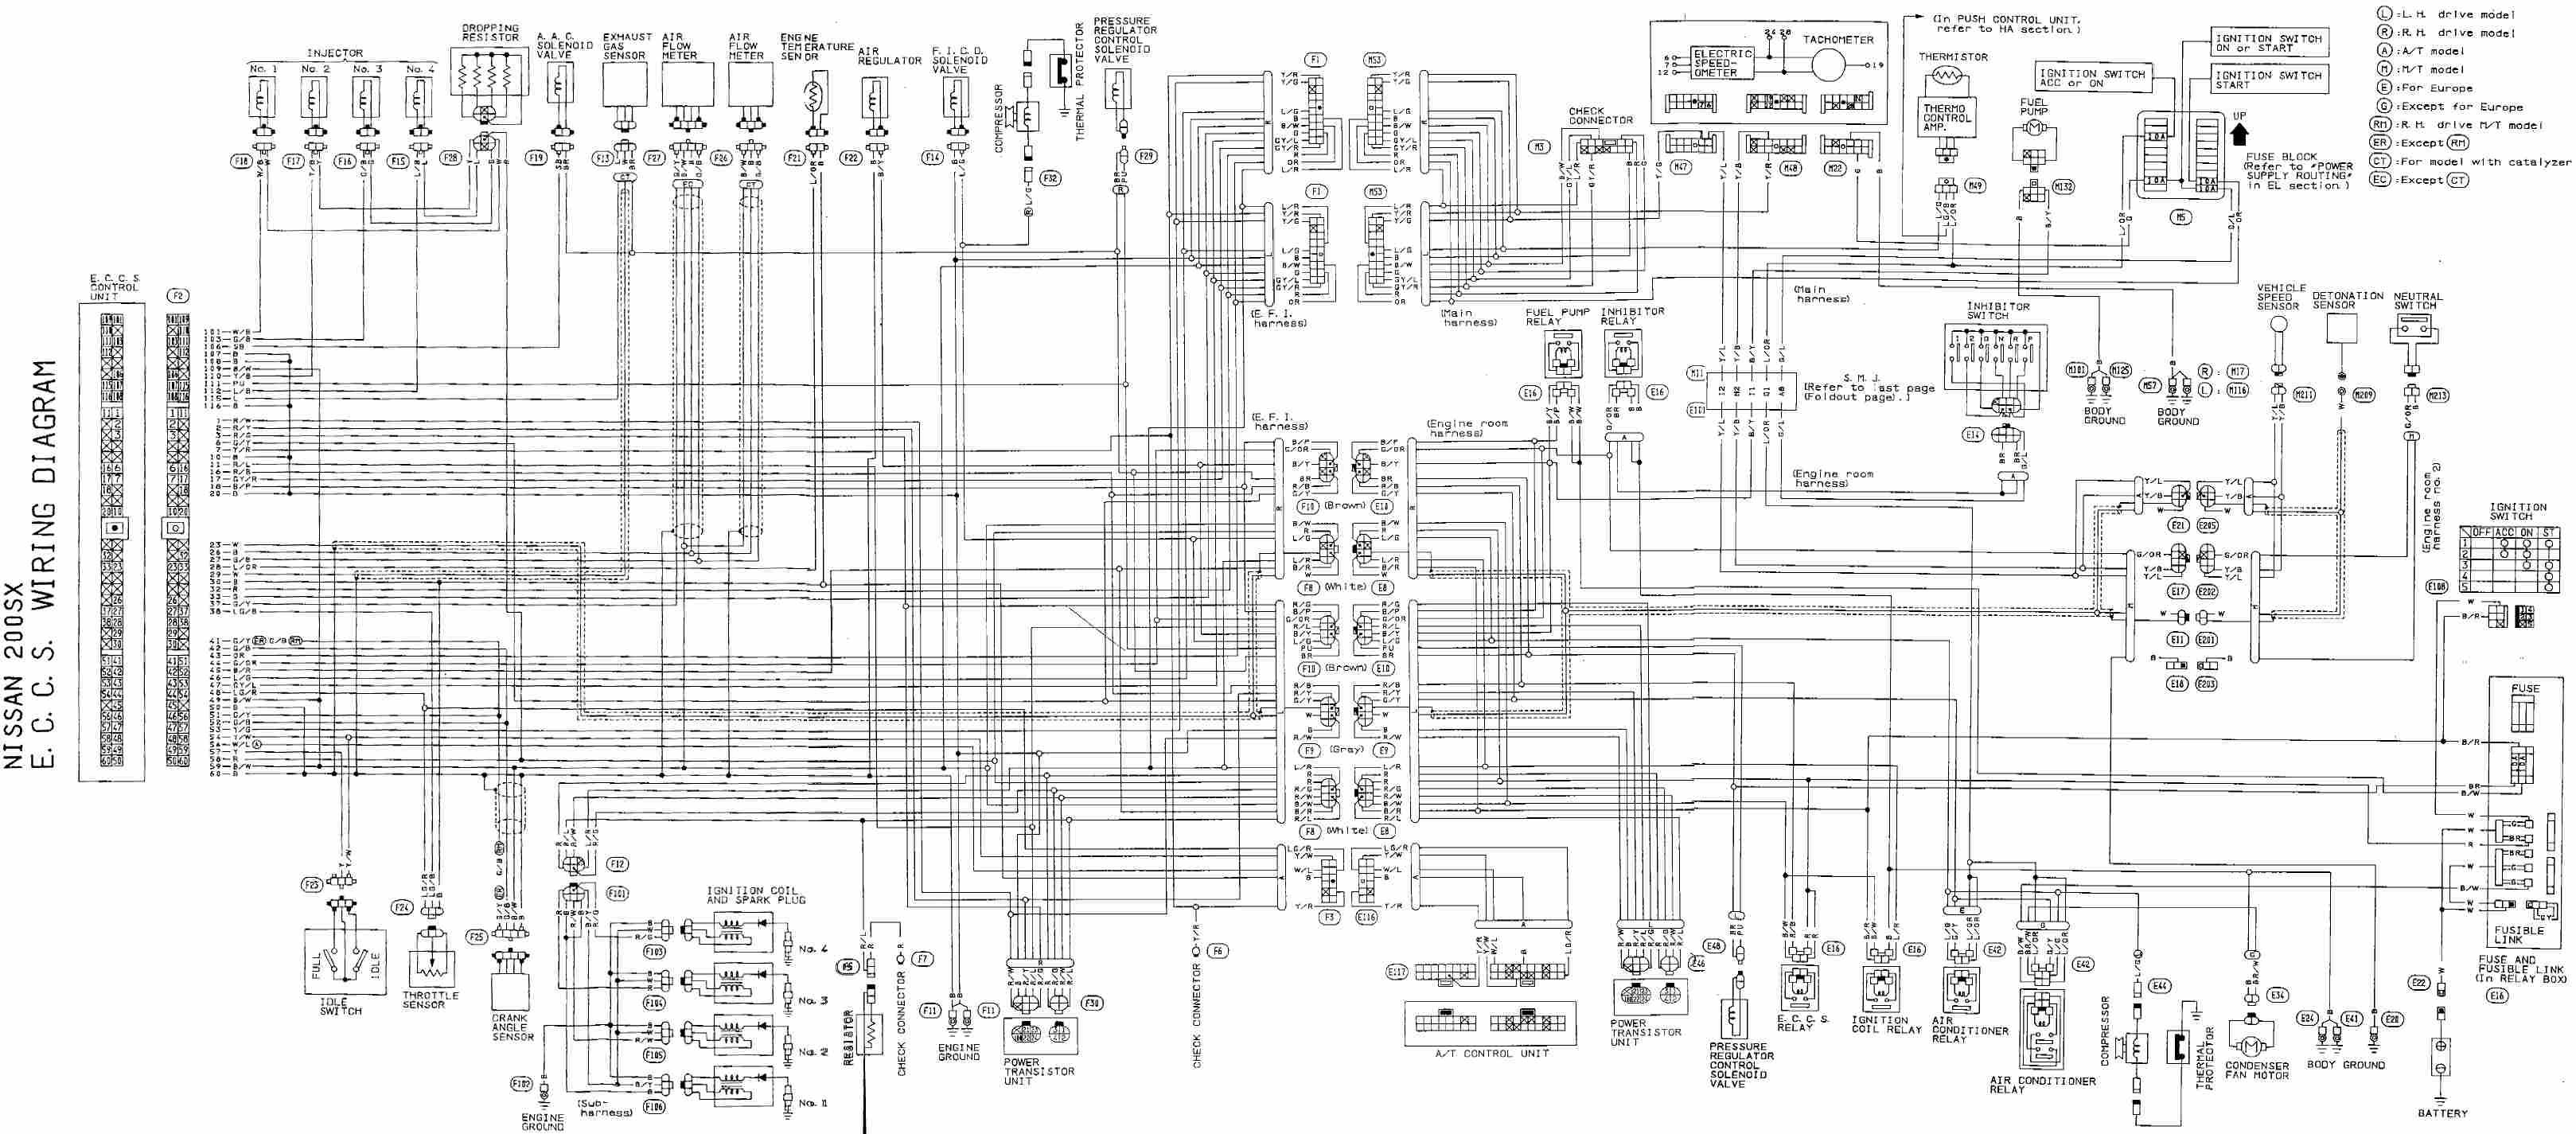 medium resolution of 2001 nissan xterra radio diagram starting know about wiring diagram u2022 2002 xterra wiring diagram 2001 nissan xterra car stereo wiring diagram